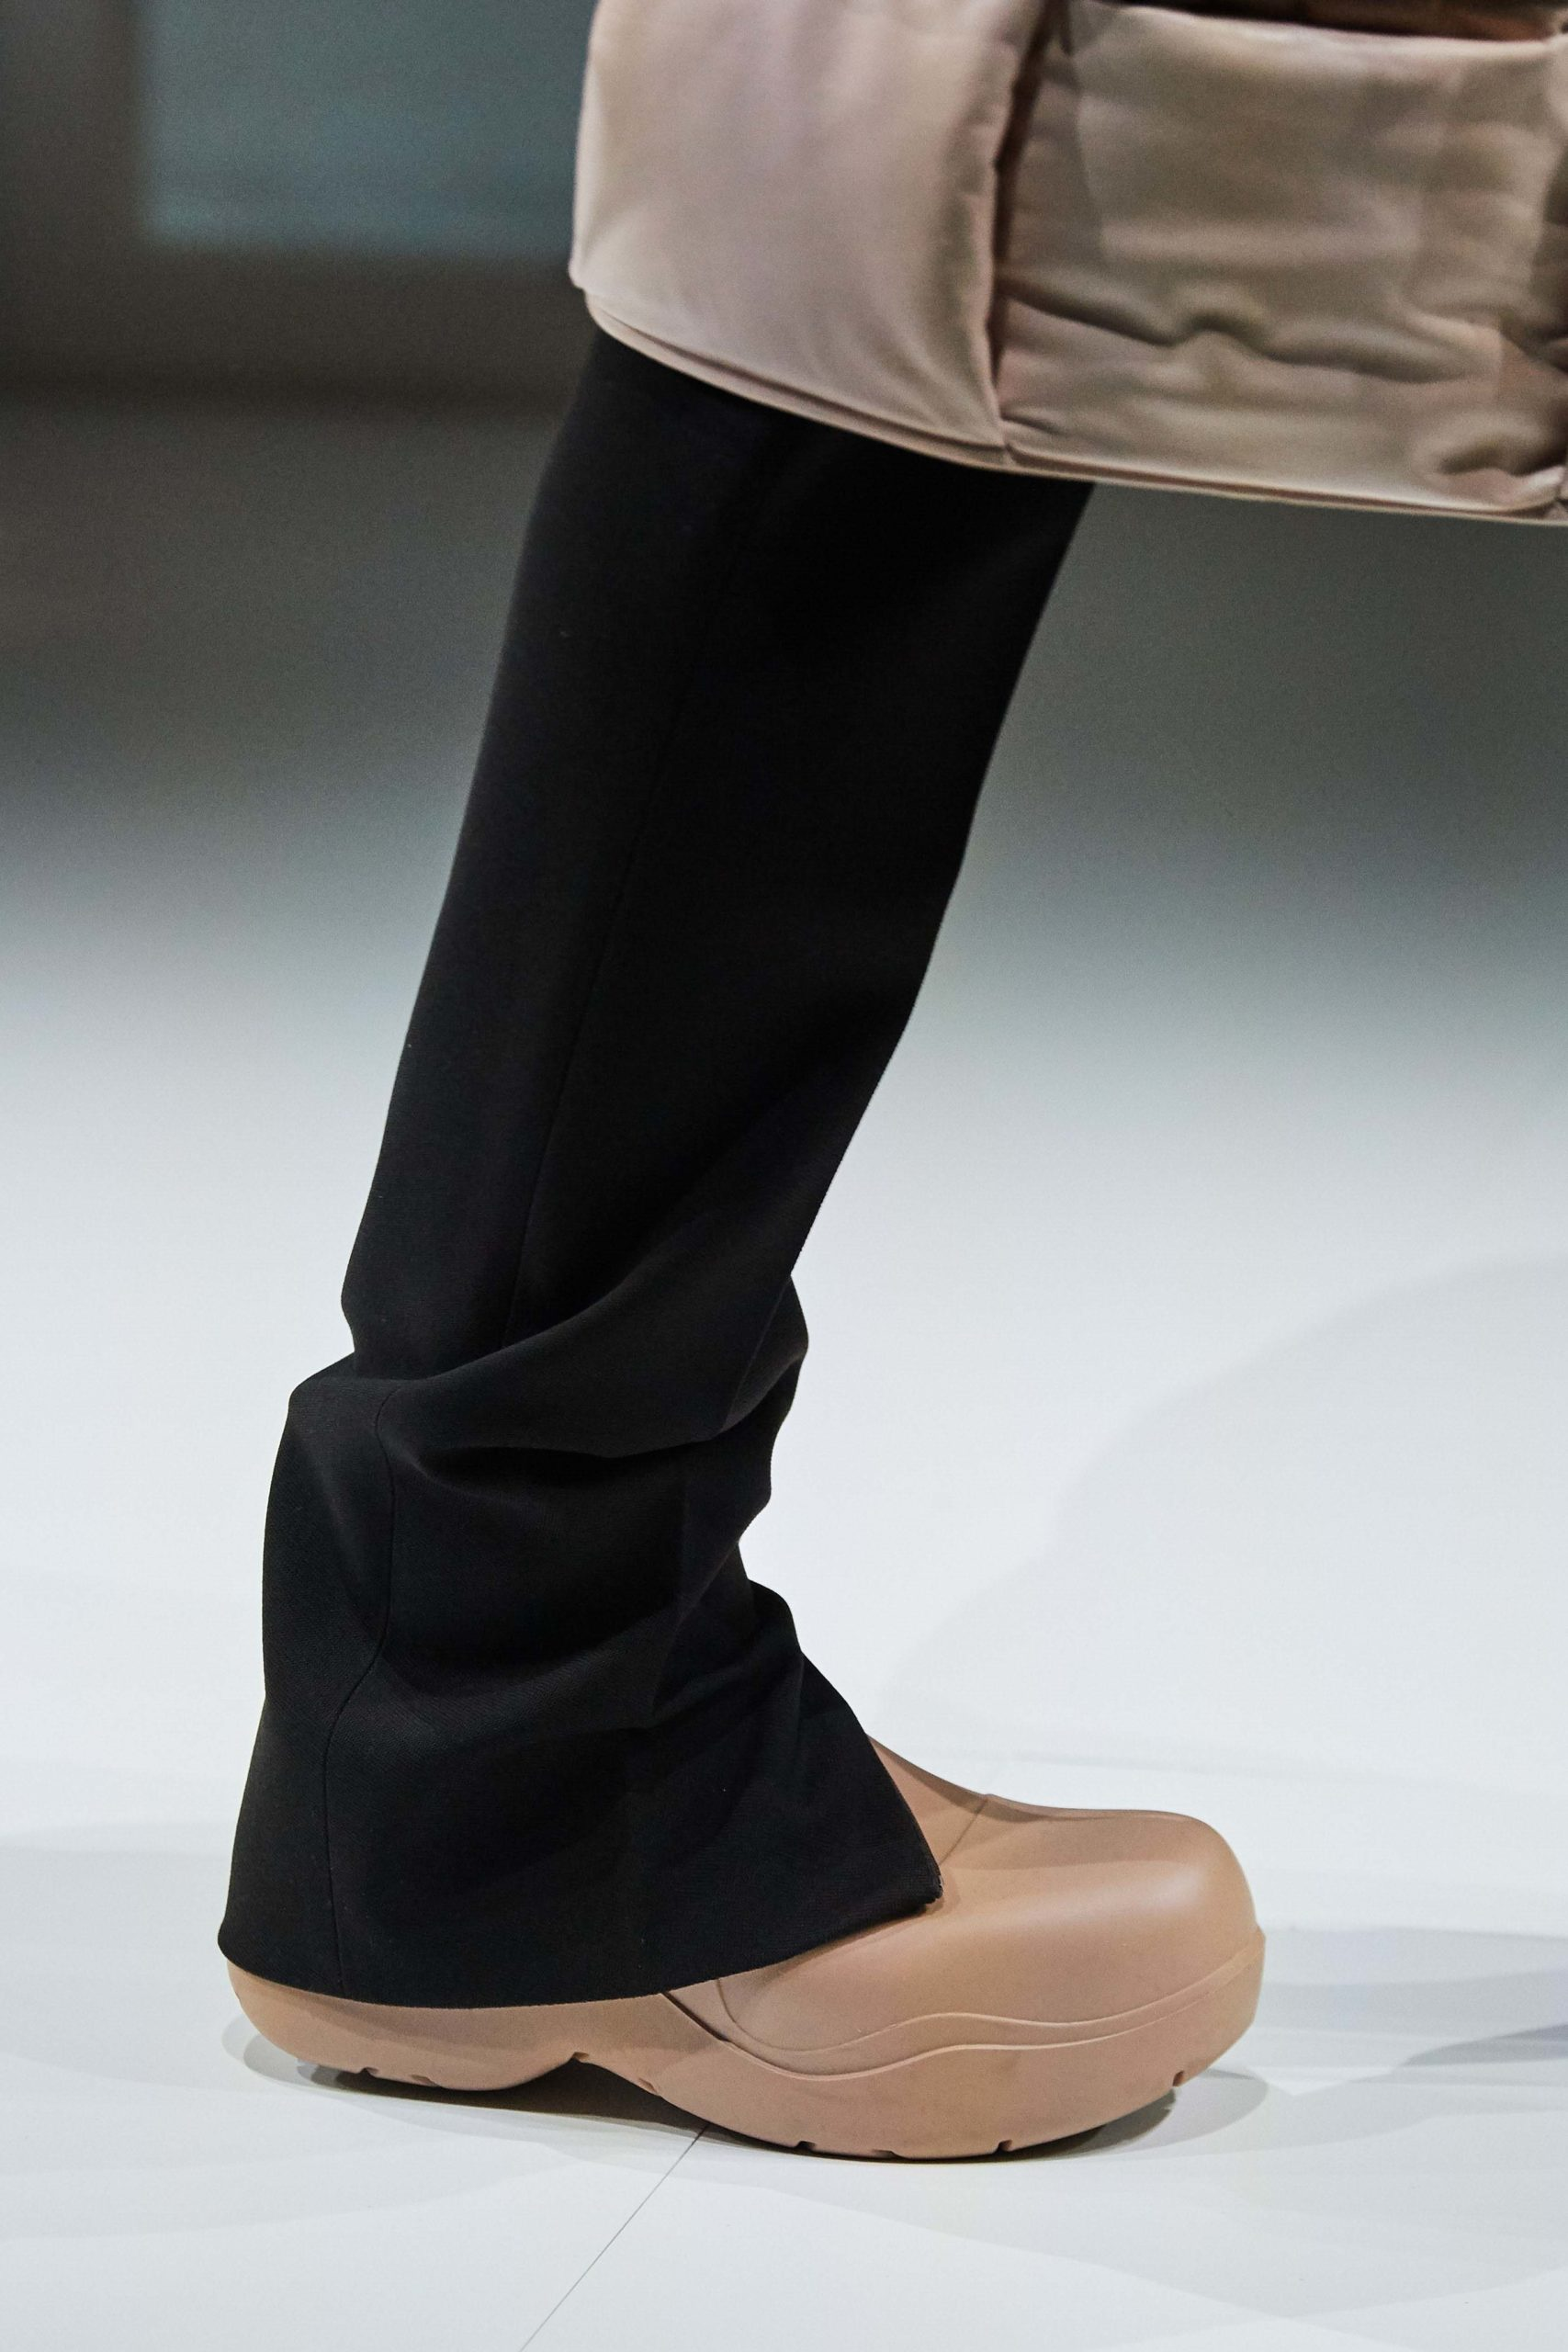 Bottega Veneta Fall 2020 trends runway report Ready To Wear Vogue details rubber rain boots